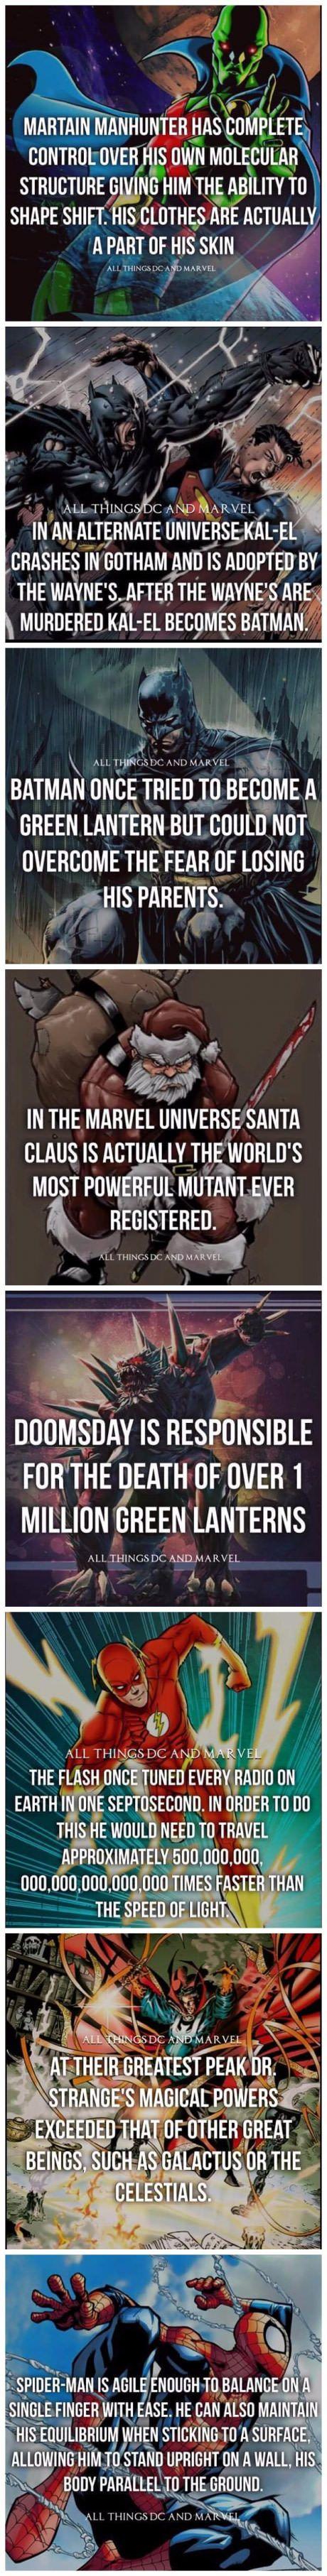 Superhero Facts: Part 2